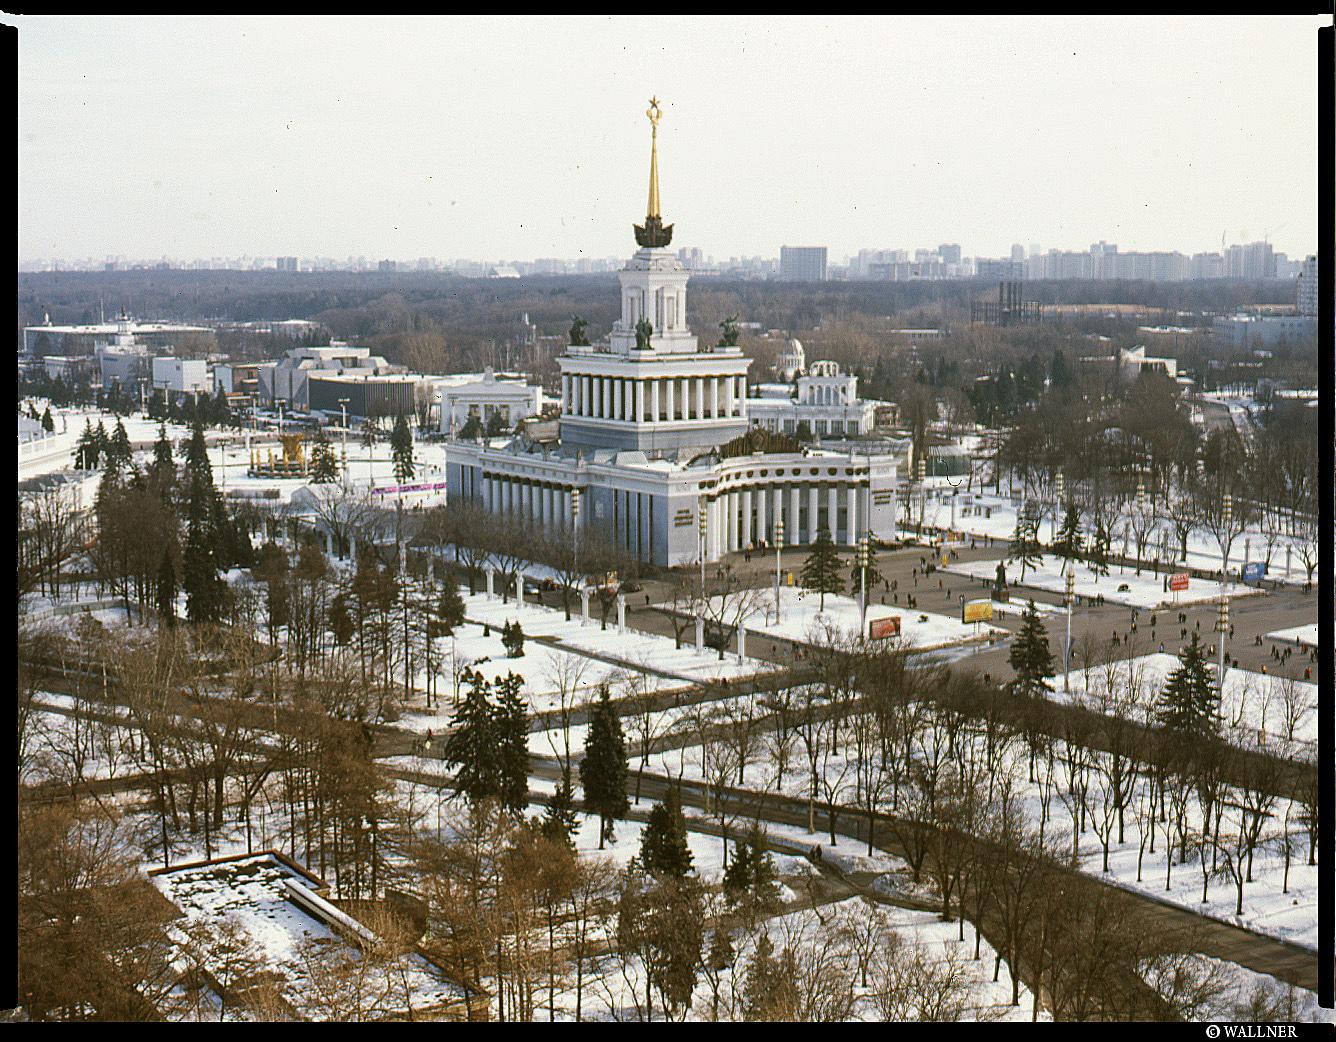 MediumFormatPatrikWallner_Moscow_OnTheFairyWheelLOWQ